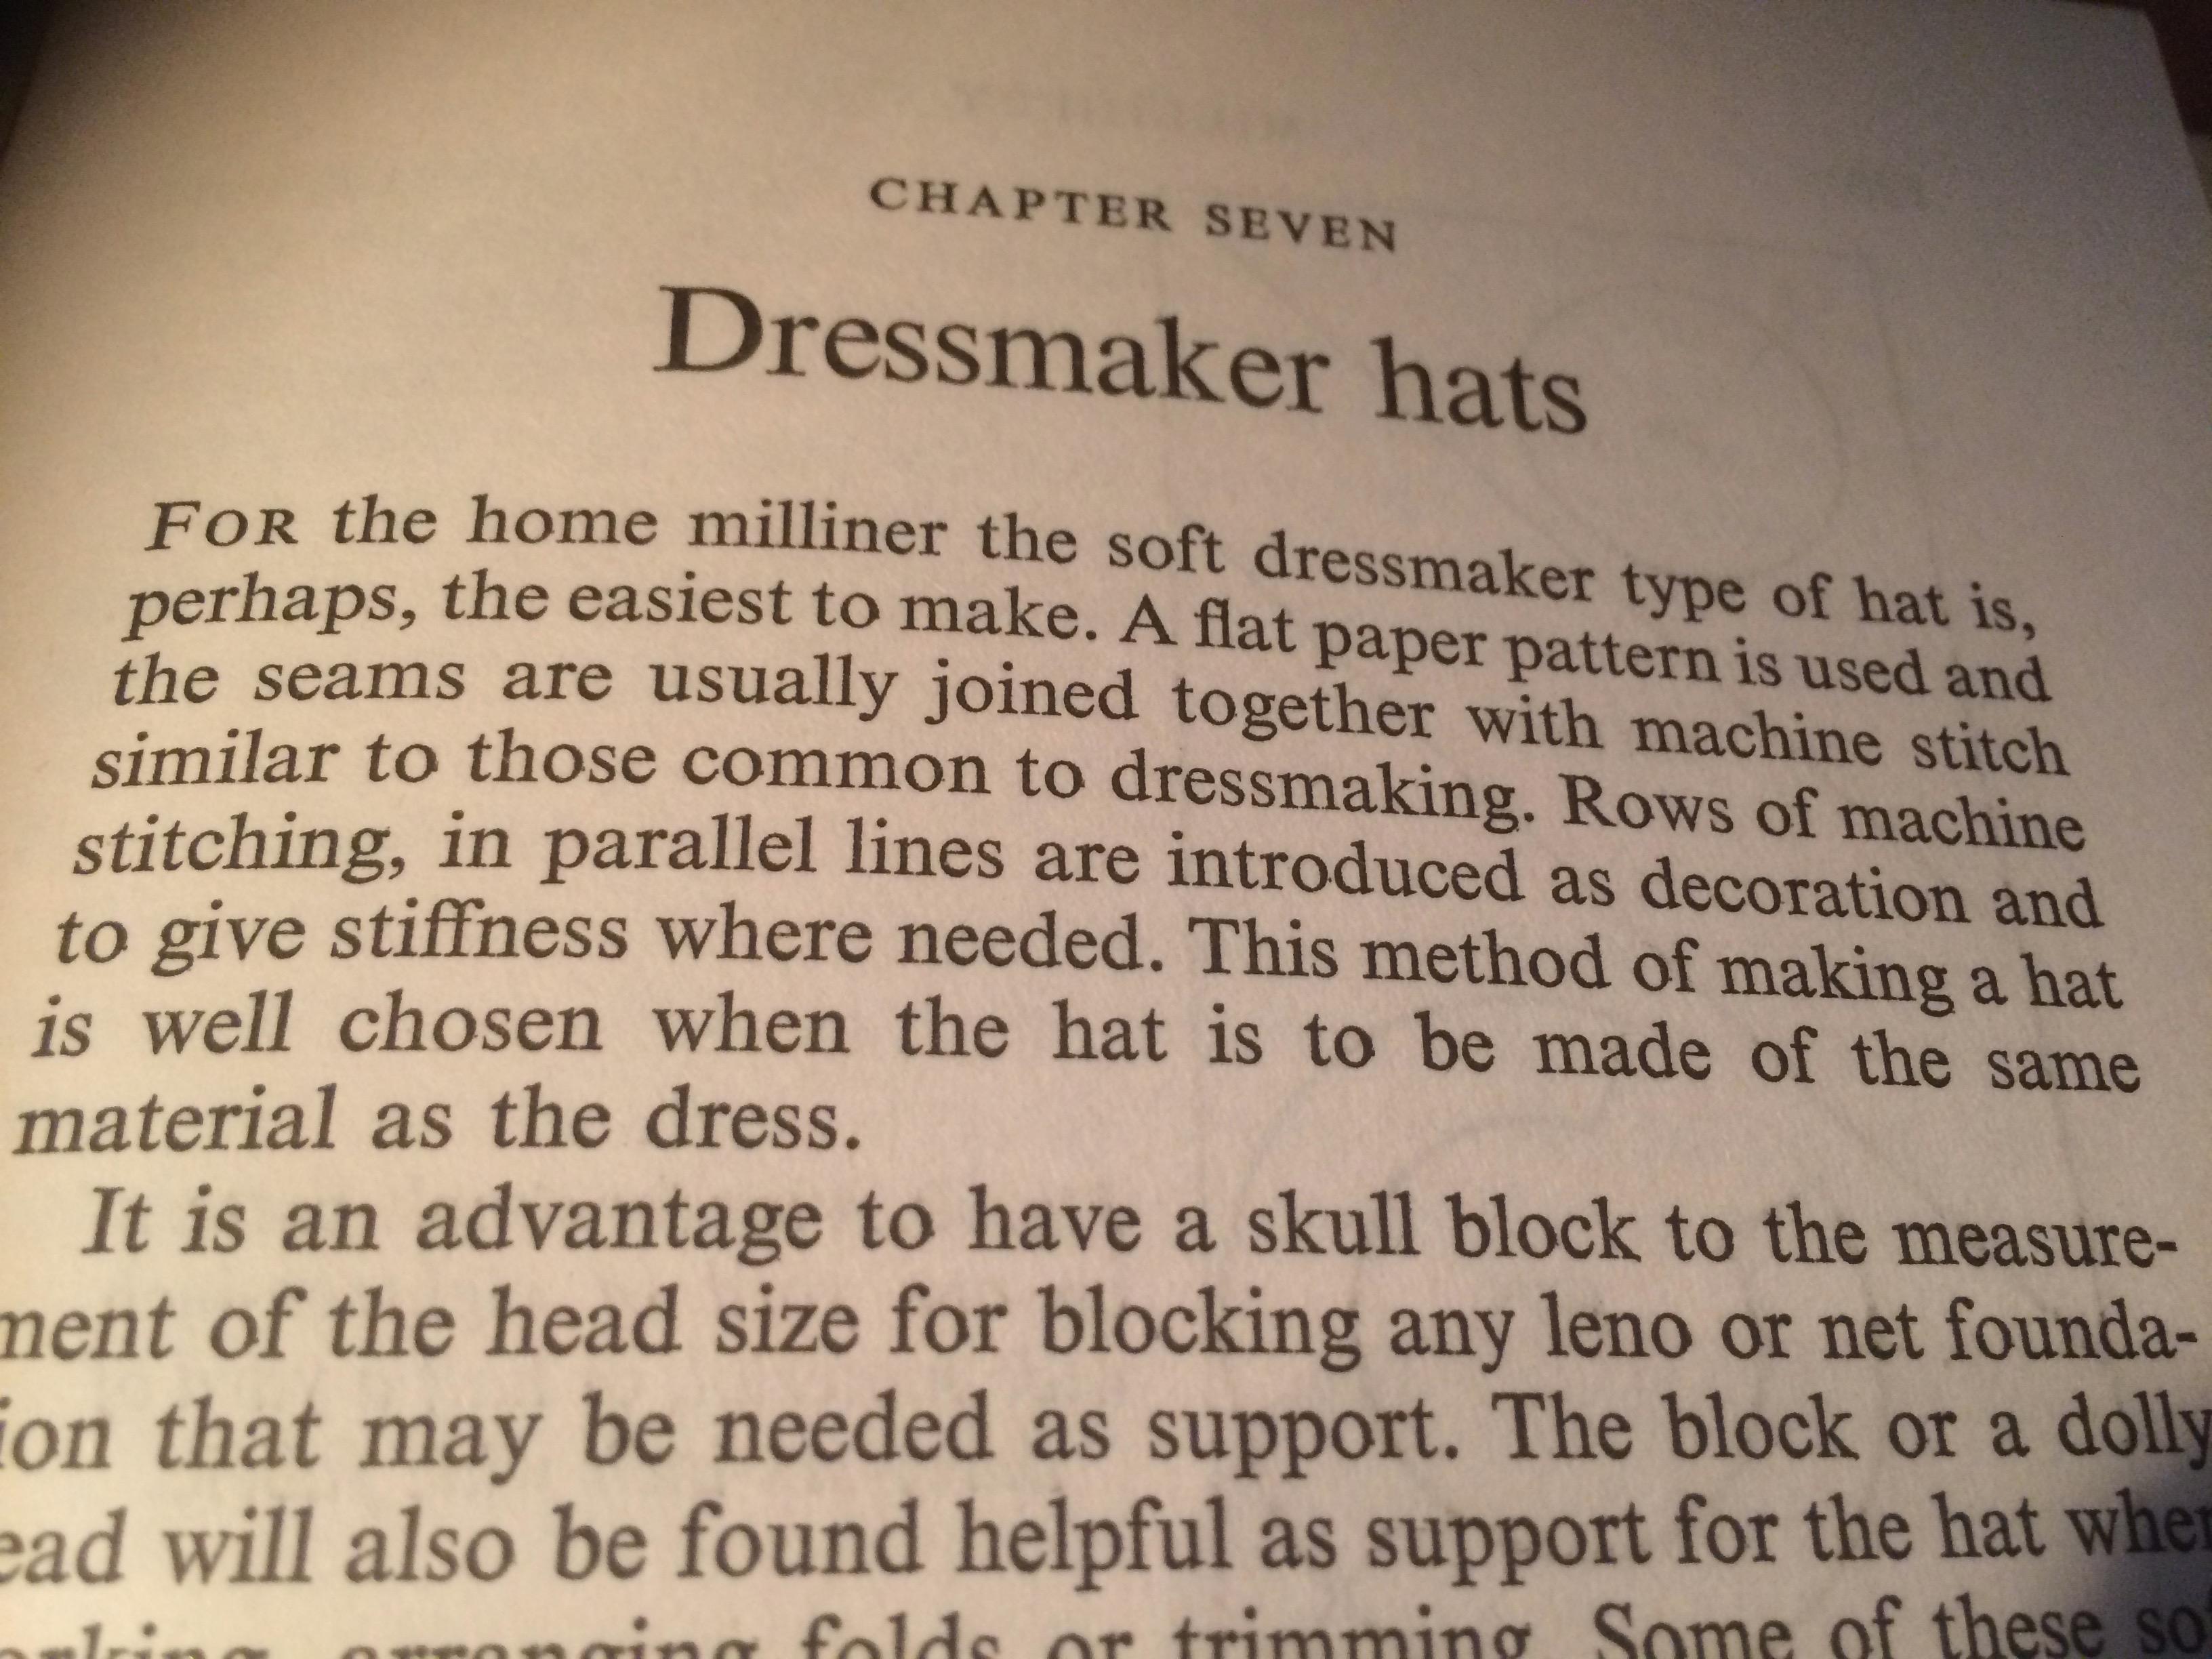 Dressmaker hats